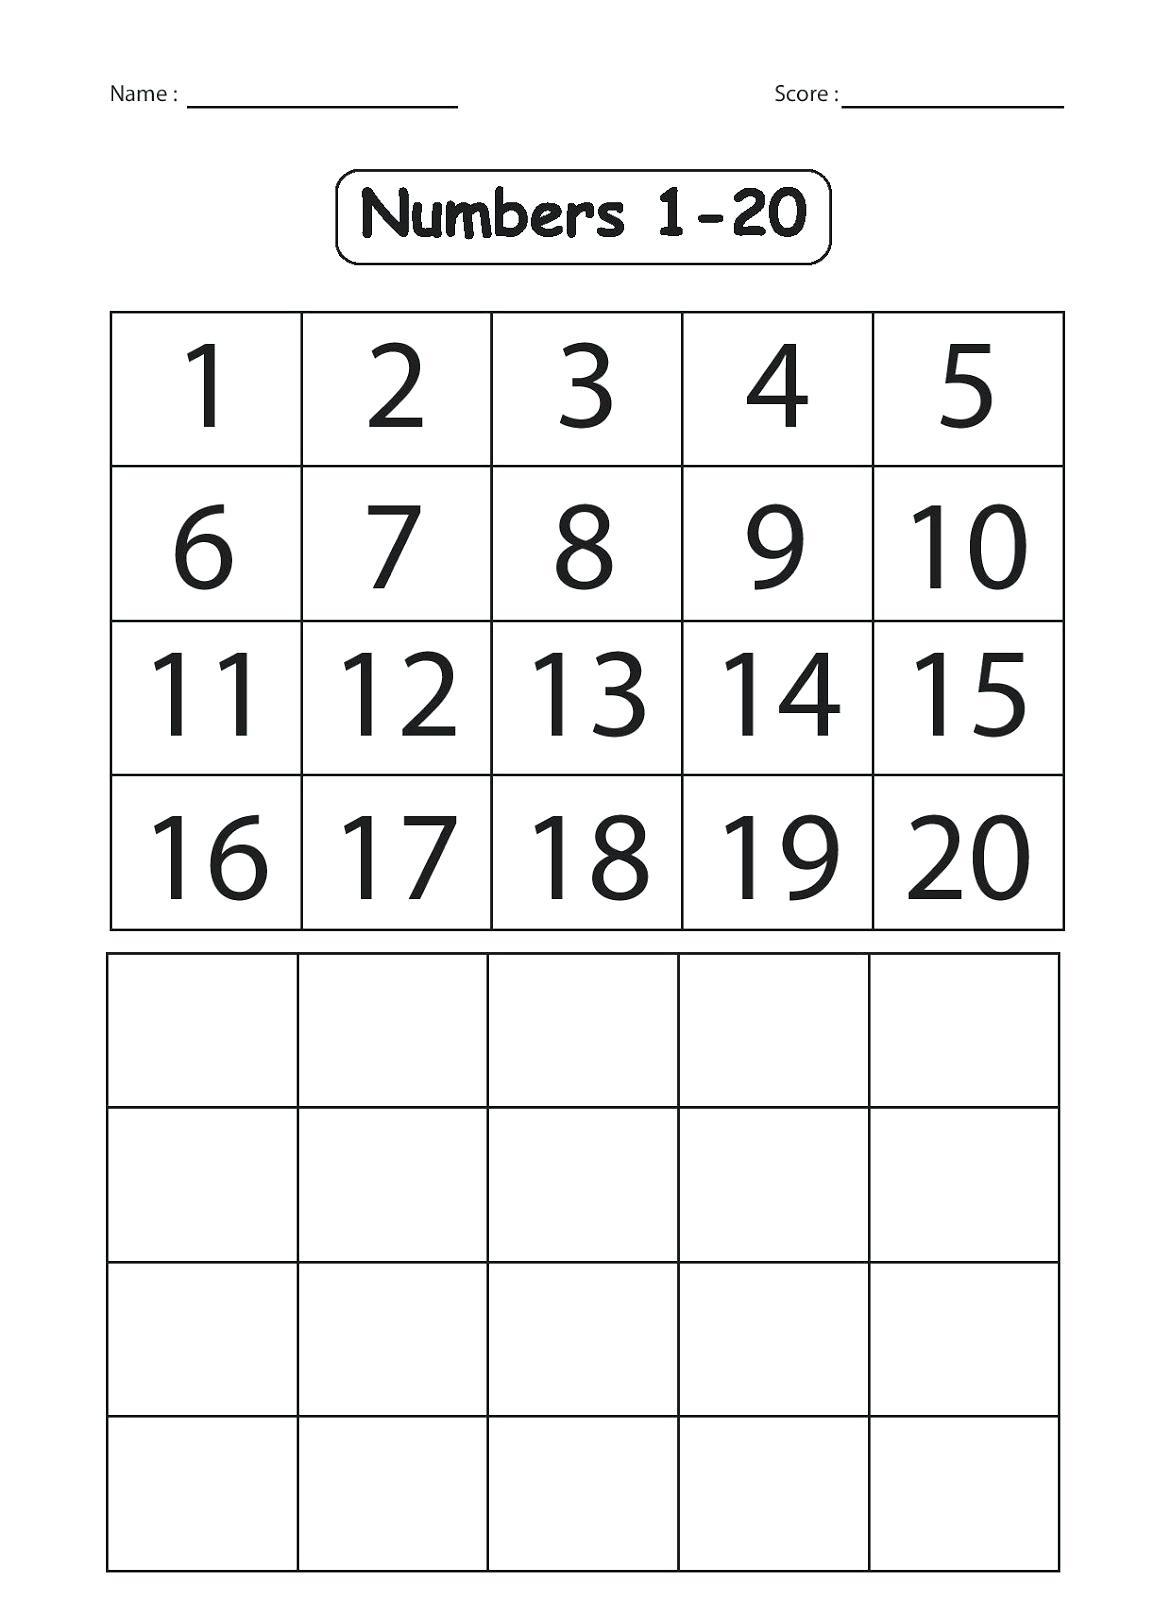 Kindergarten Number Worksheets 1 20 Worksheets Numbers 1 For - Free Printable Counting Worksheets 1 20